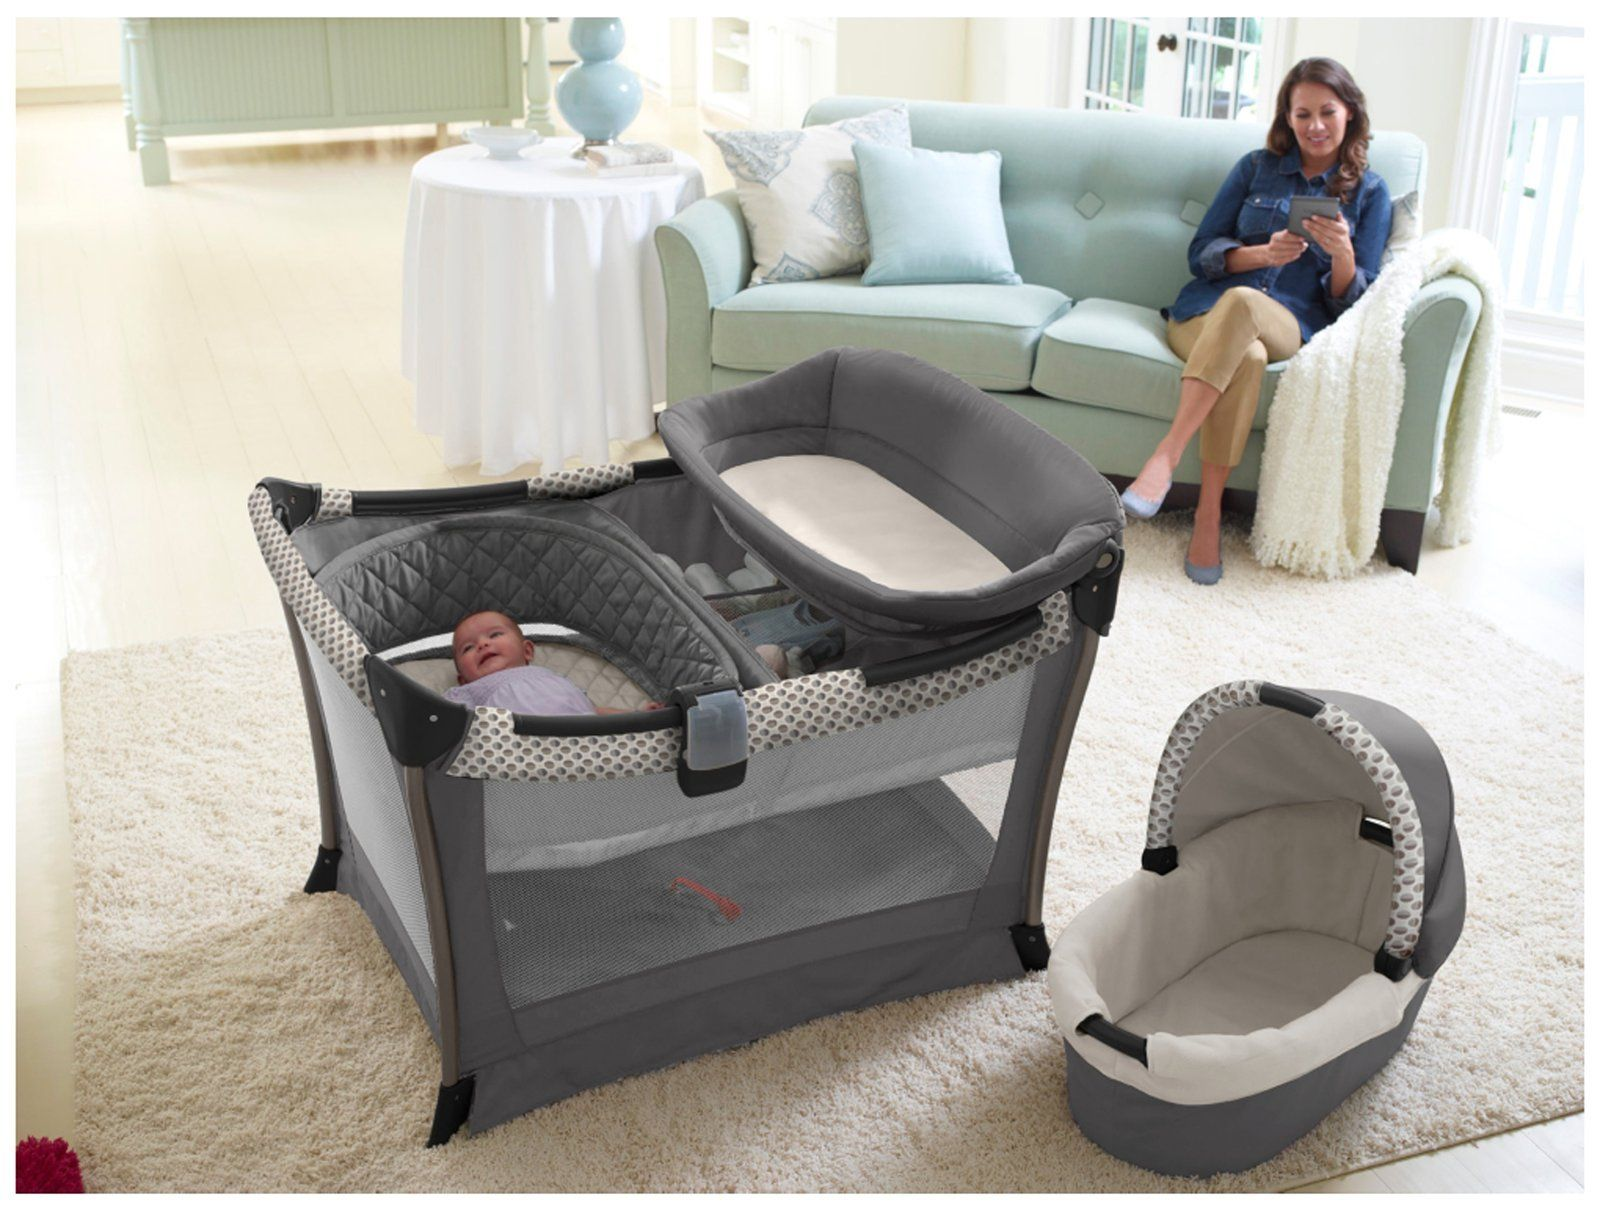 graco bedroom bassinet portable crib. graco day2night sleep system - bedroom bassinet \u0026 pack \u0027n play playard ardmore portable crib b